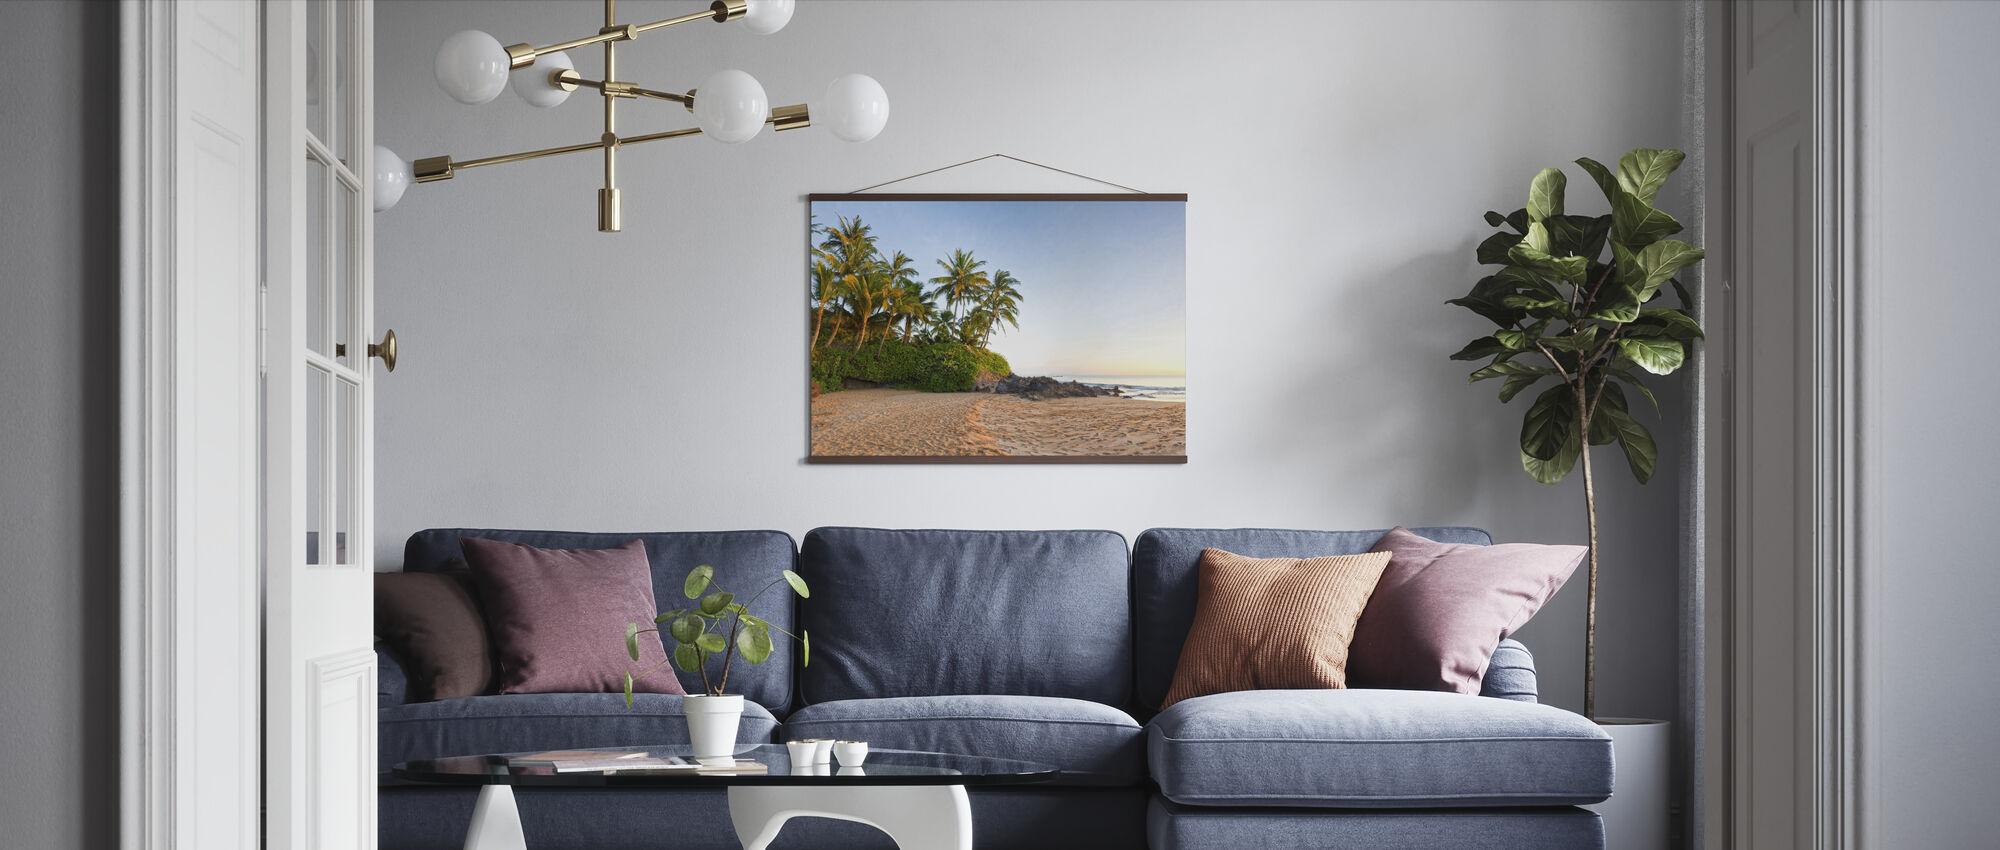 Sunset Beach - Plakat - Stue